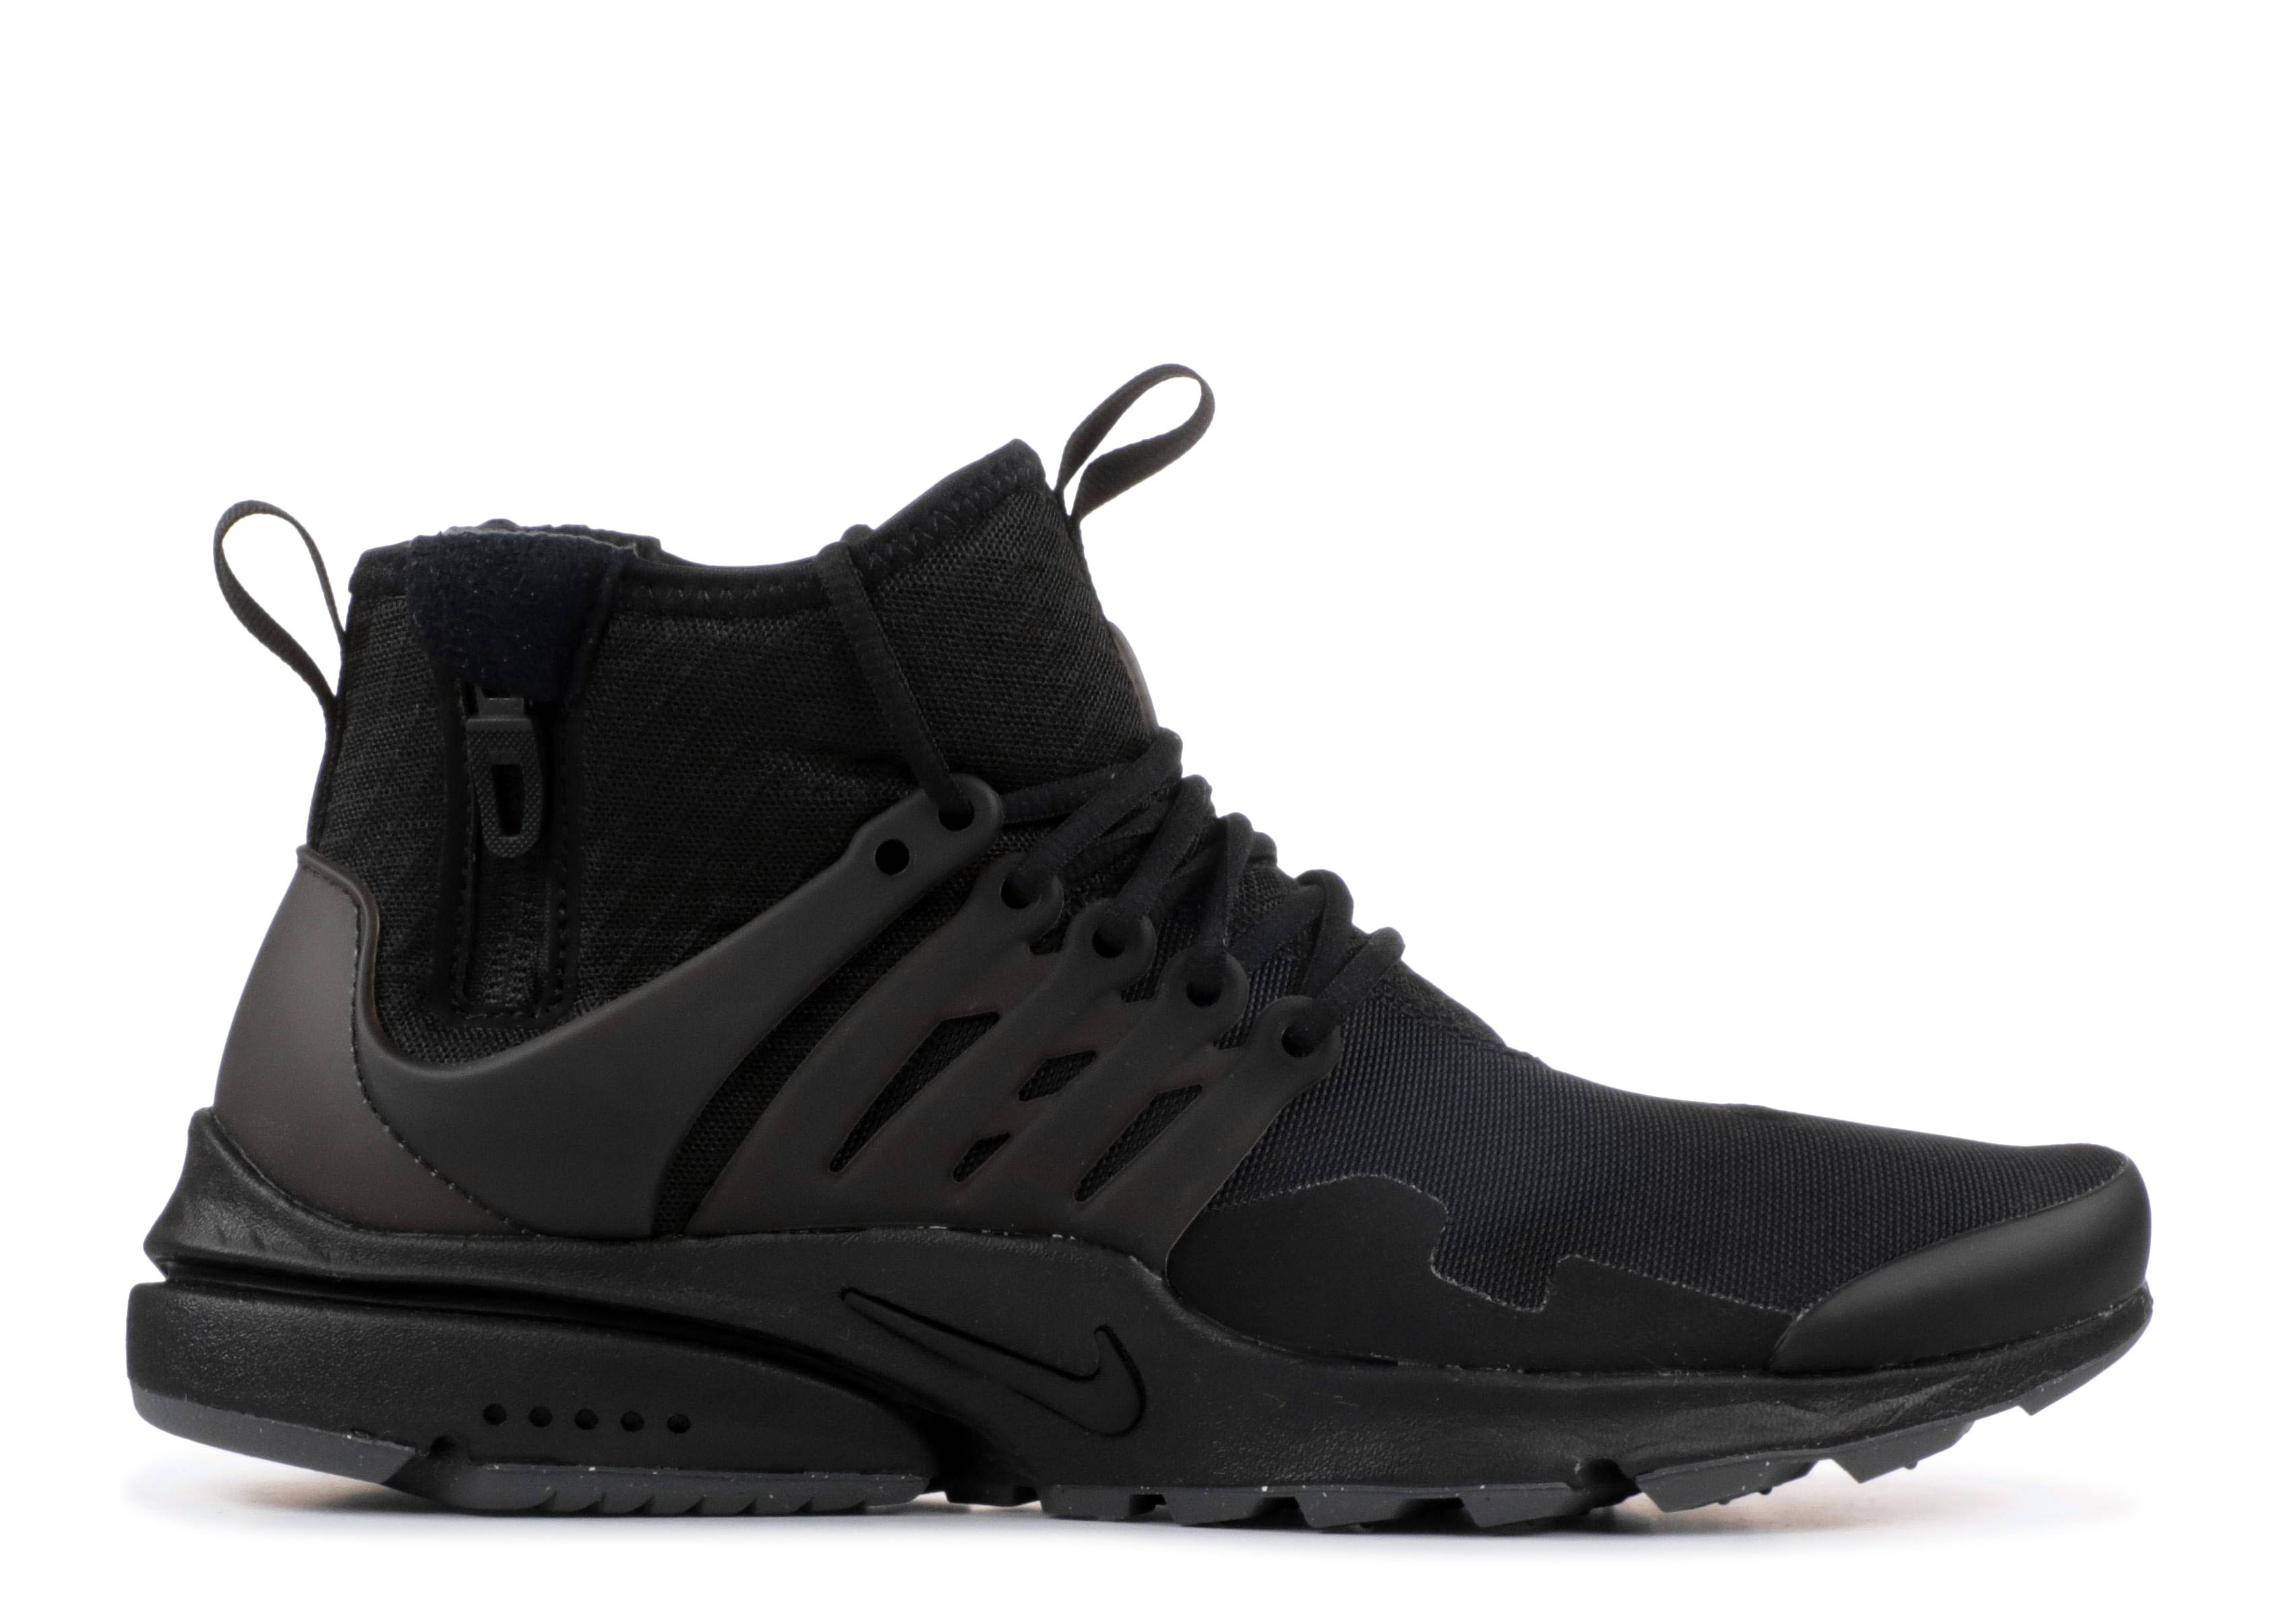 afa86b280 Nike Air Presto Mid Utility - Nike - 859524 006 - black/black-black ...